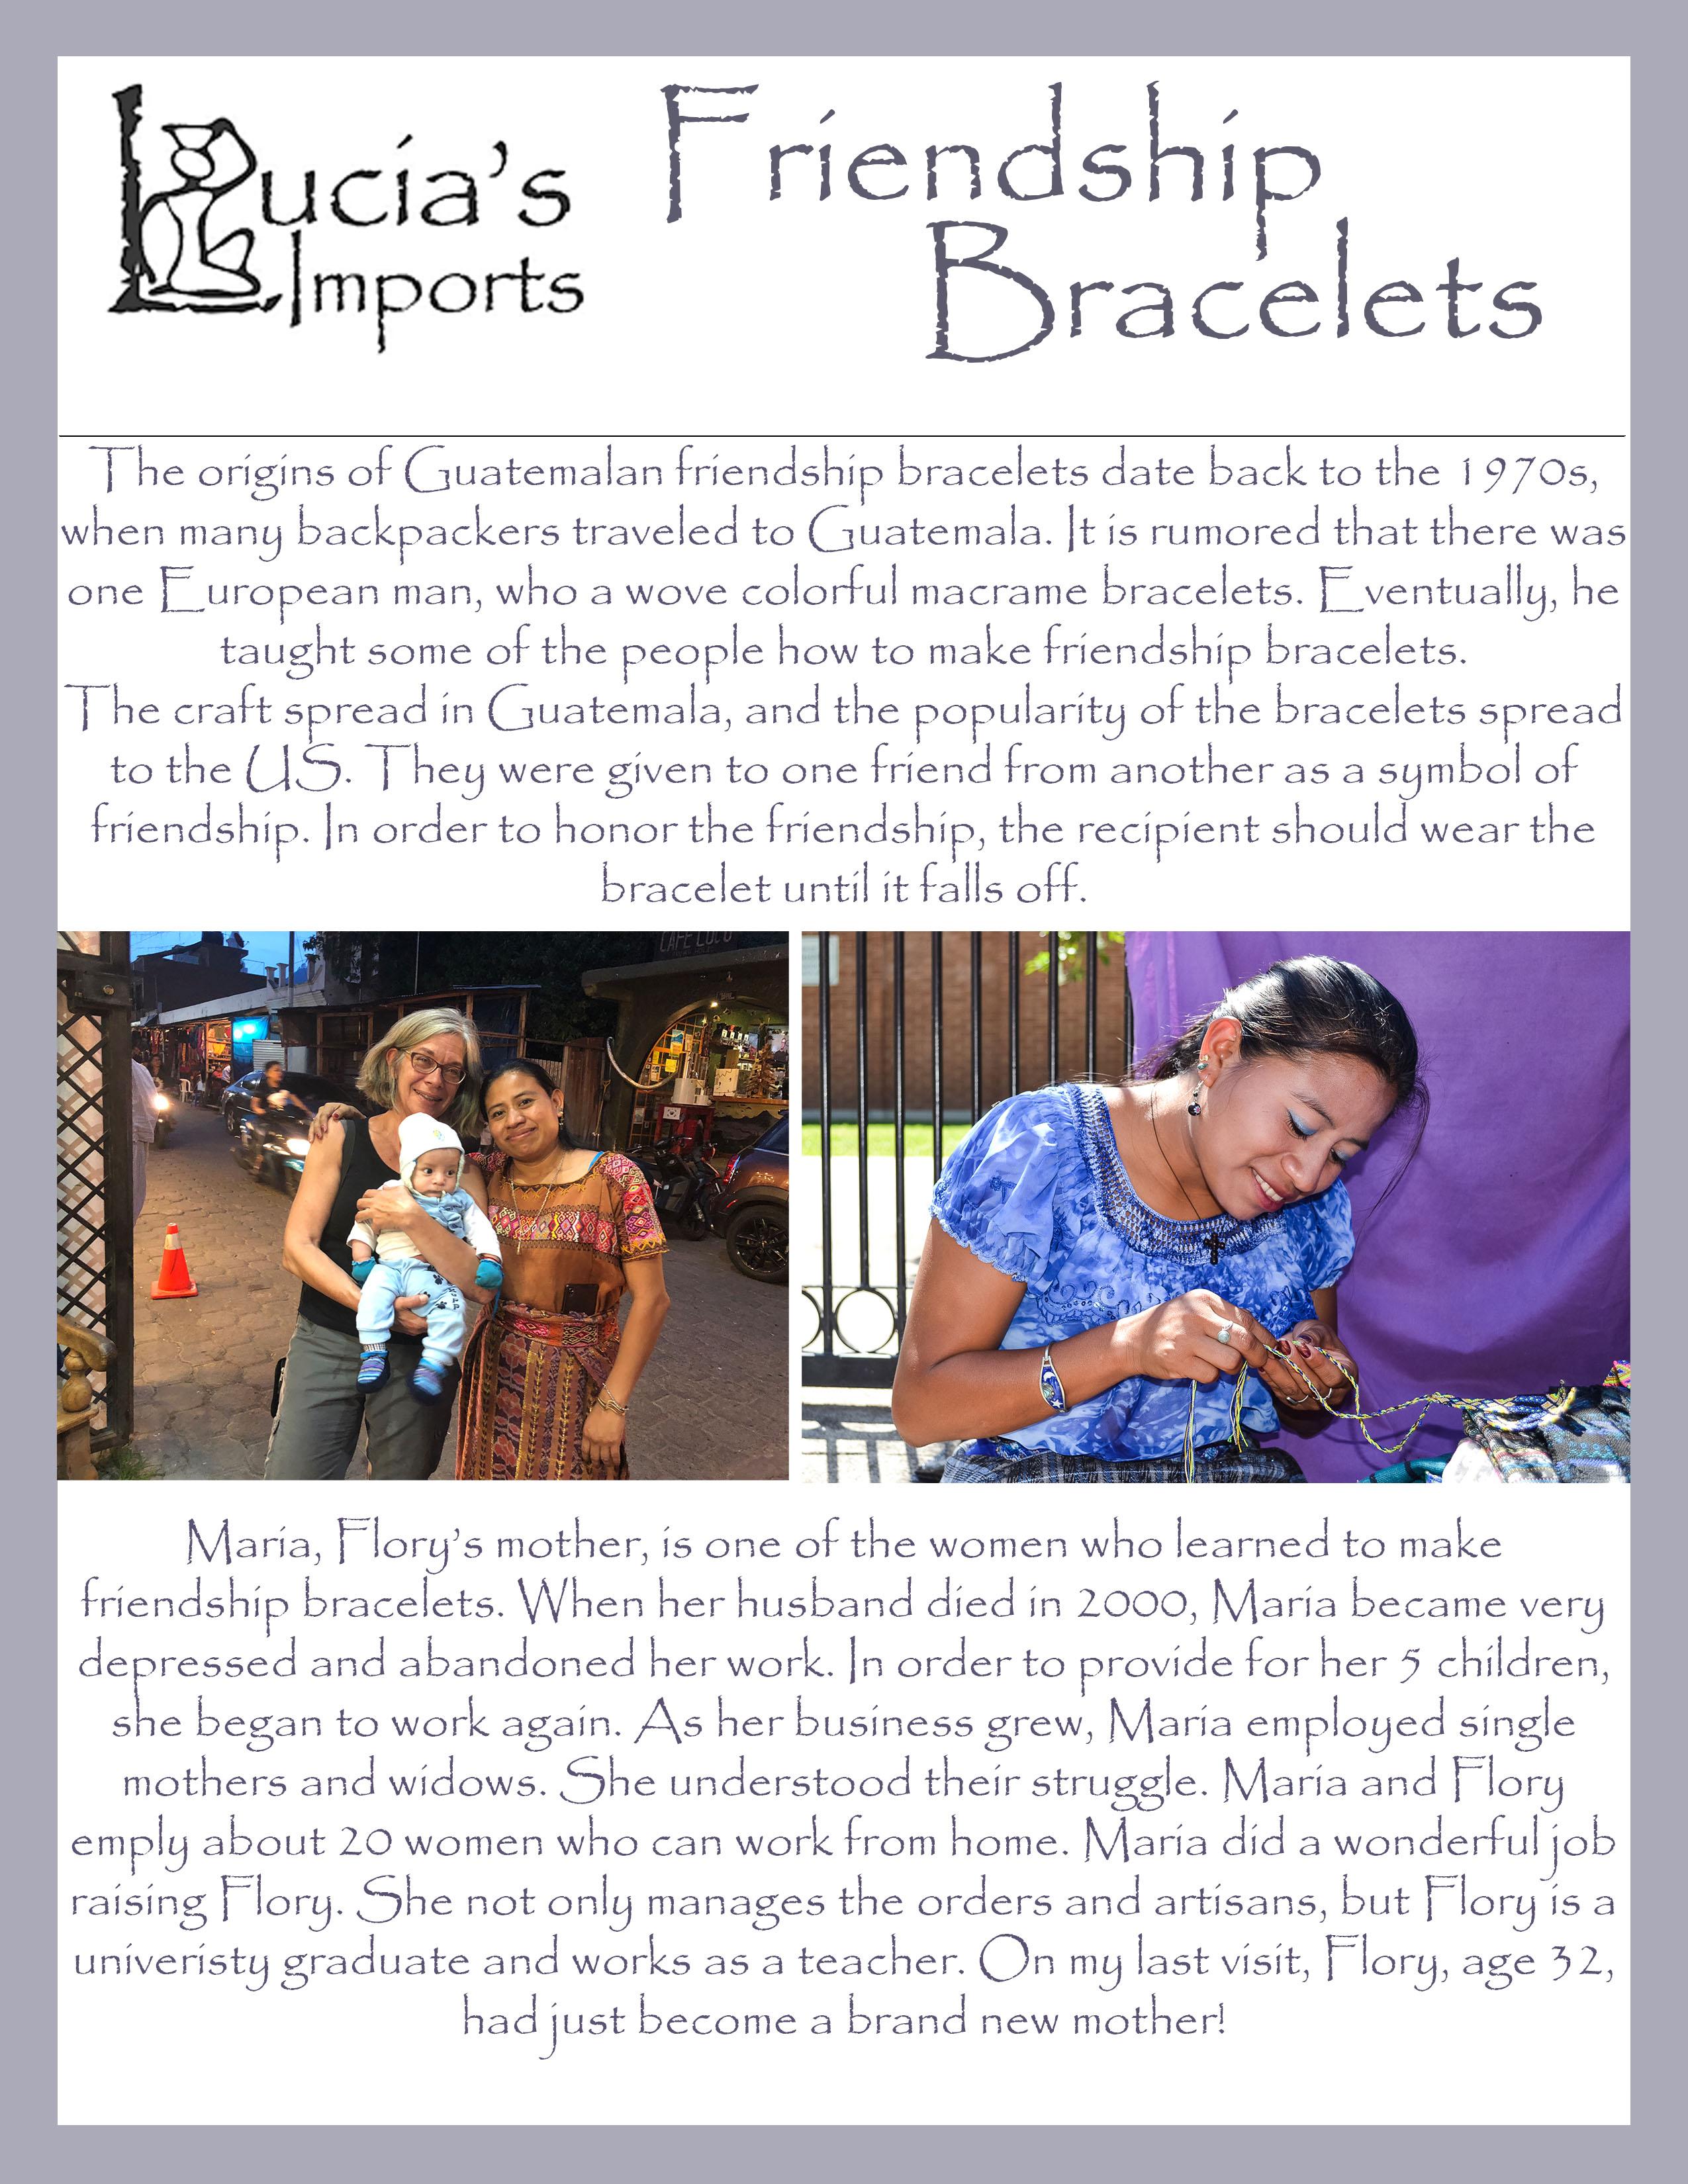 Friendhsip Bracelets